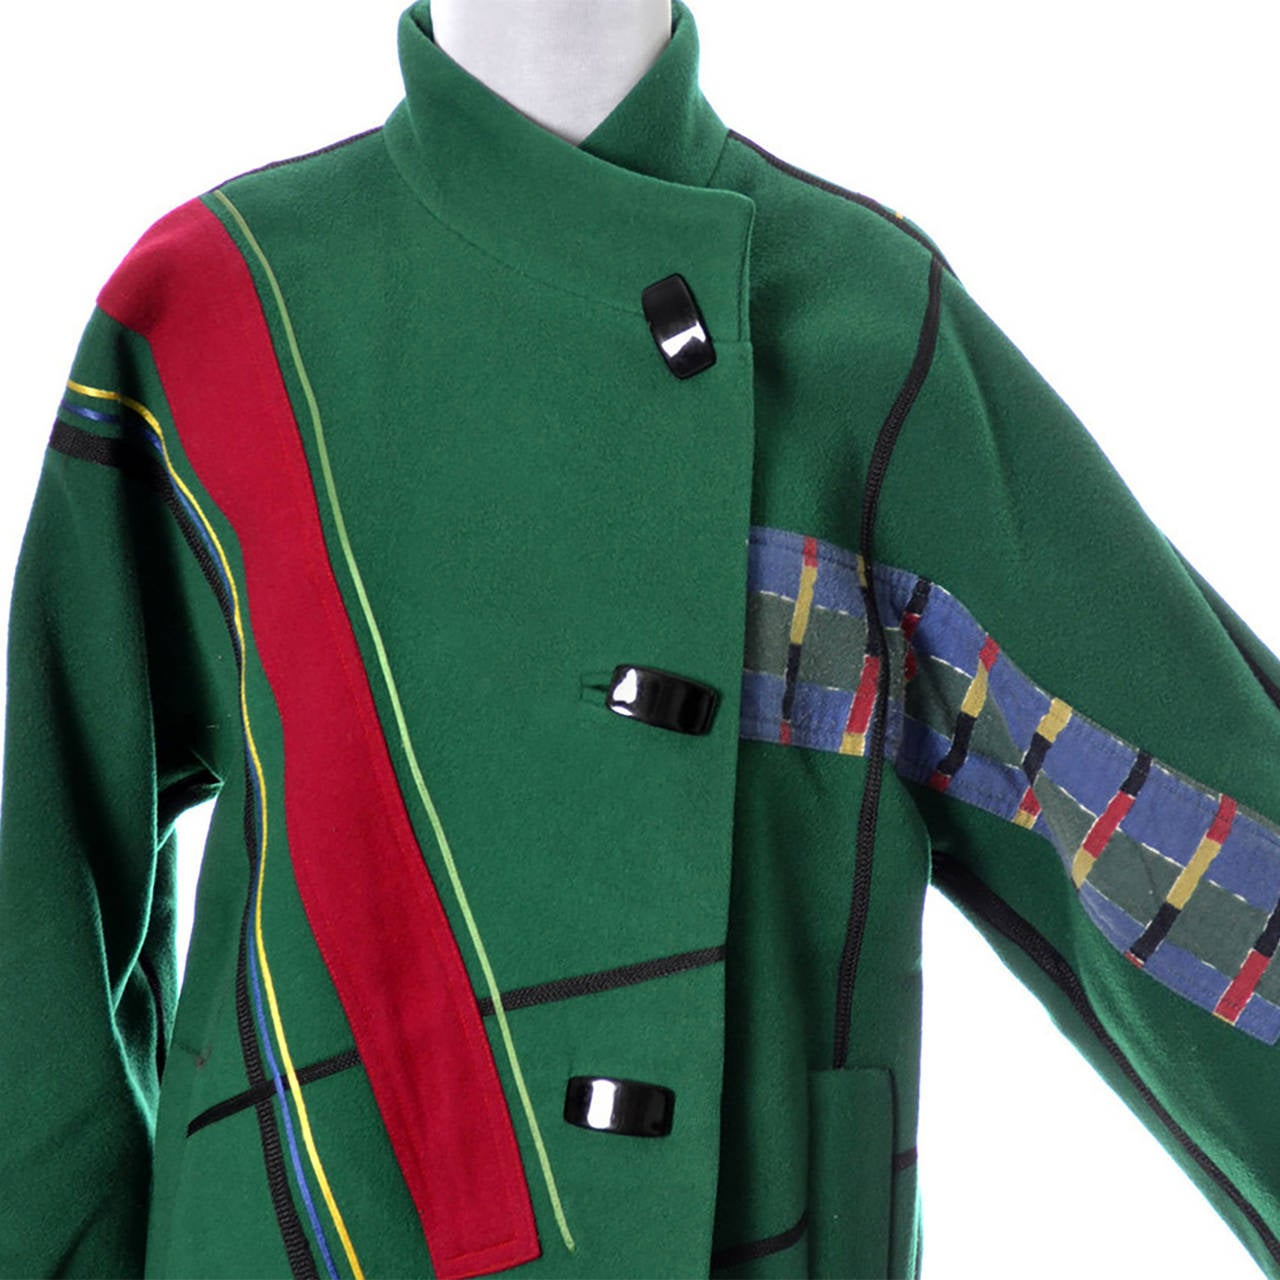 Koos Van Den Akker Vintage Coat Artisan Patchwork Collage Green Wool In Excellent Condition For Sale In Portland, OR